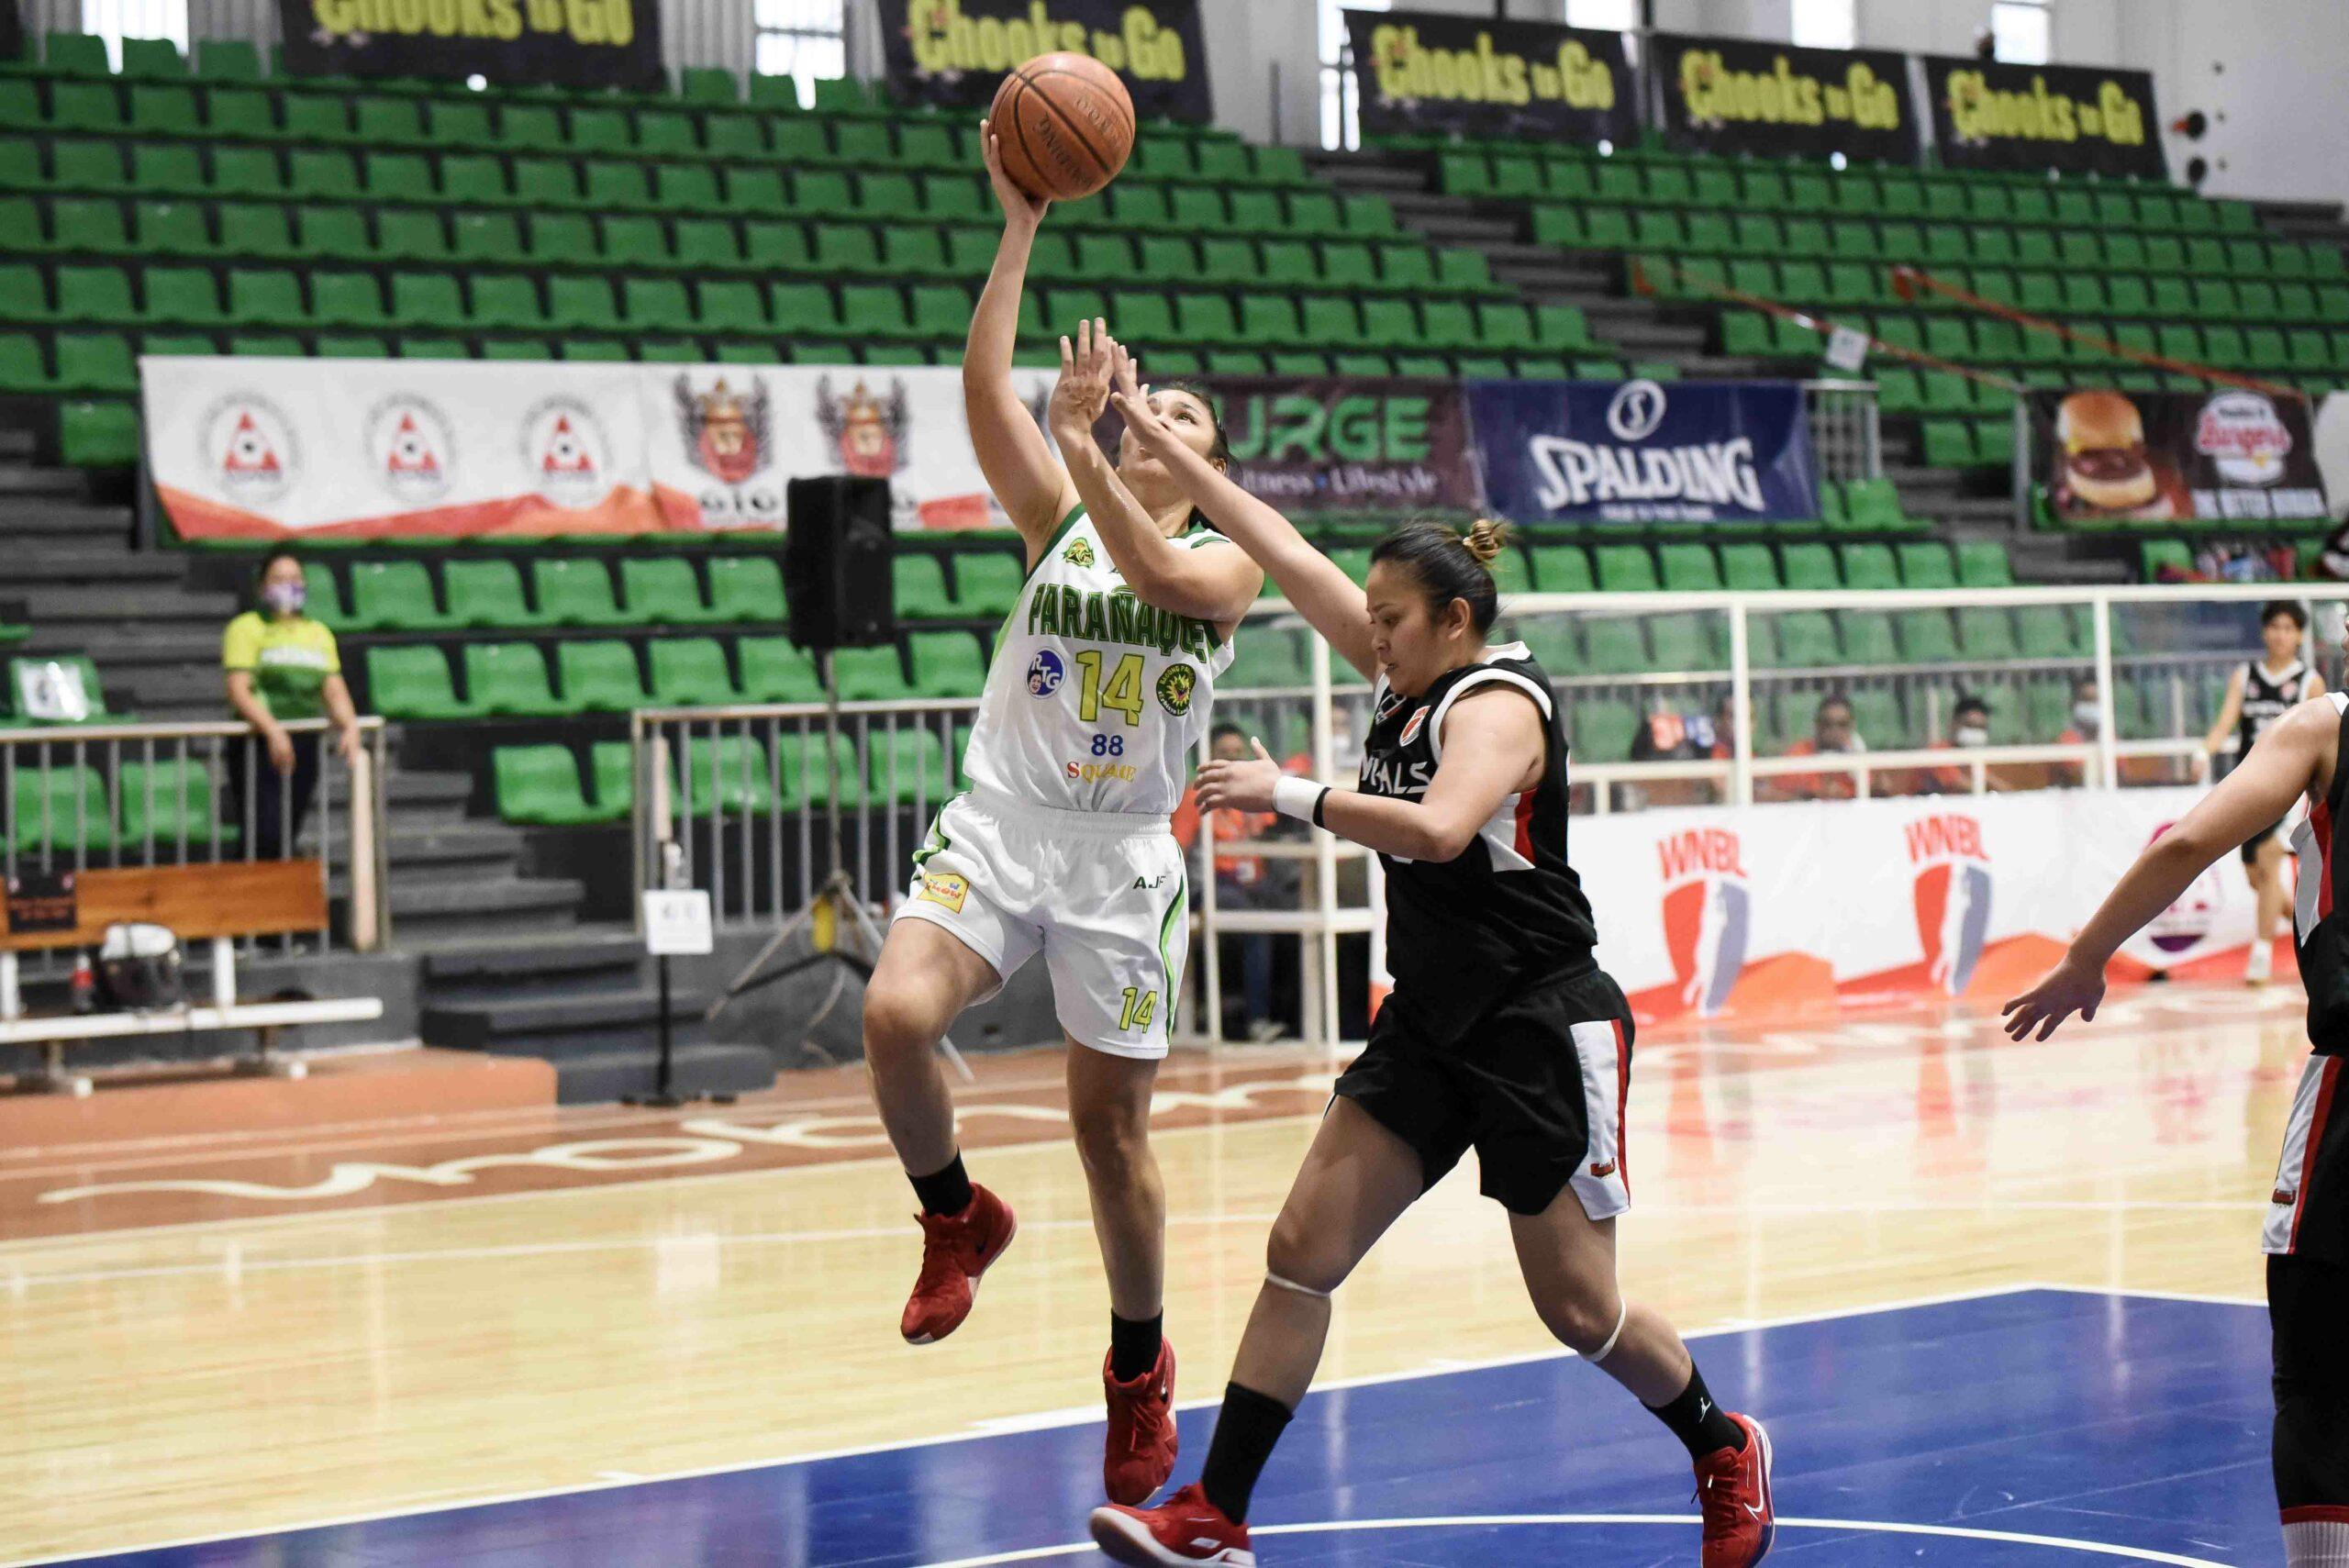 2021-pia-wnbl-paranaque-vs-taguig-april-siat-scaled Allana Lim dominates, tows Parañaque past Taguig in WNBL Basketball NBL News  - philippine sports news